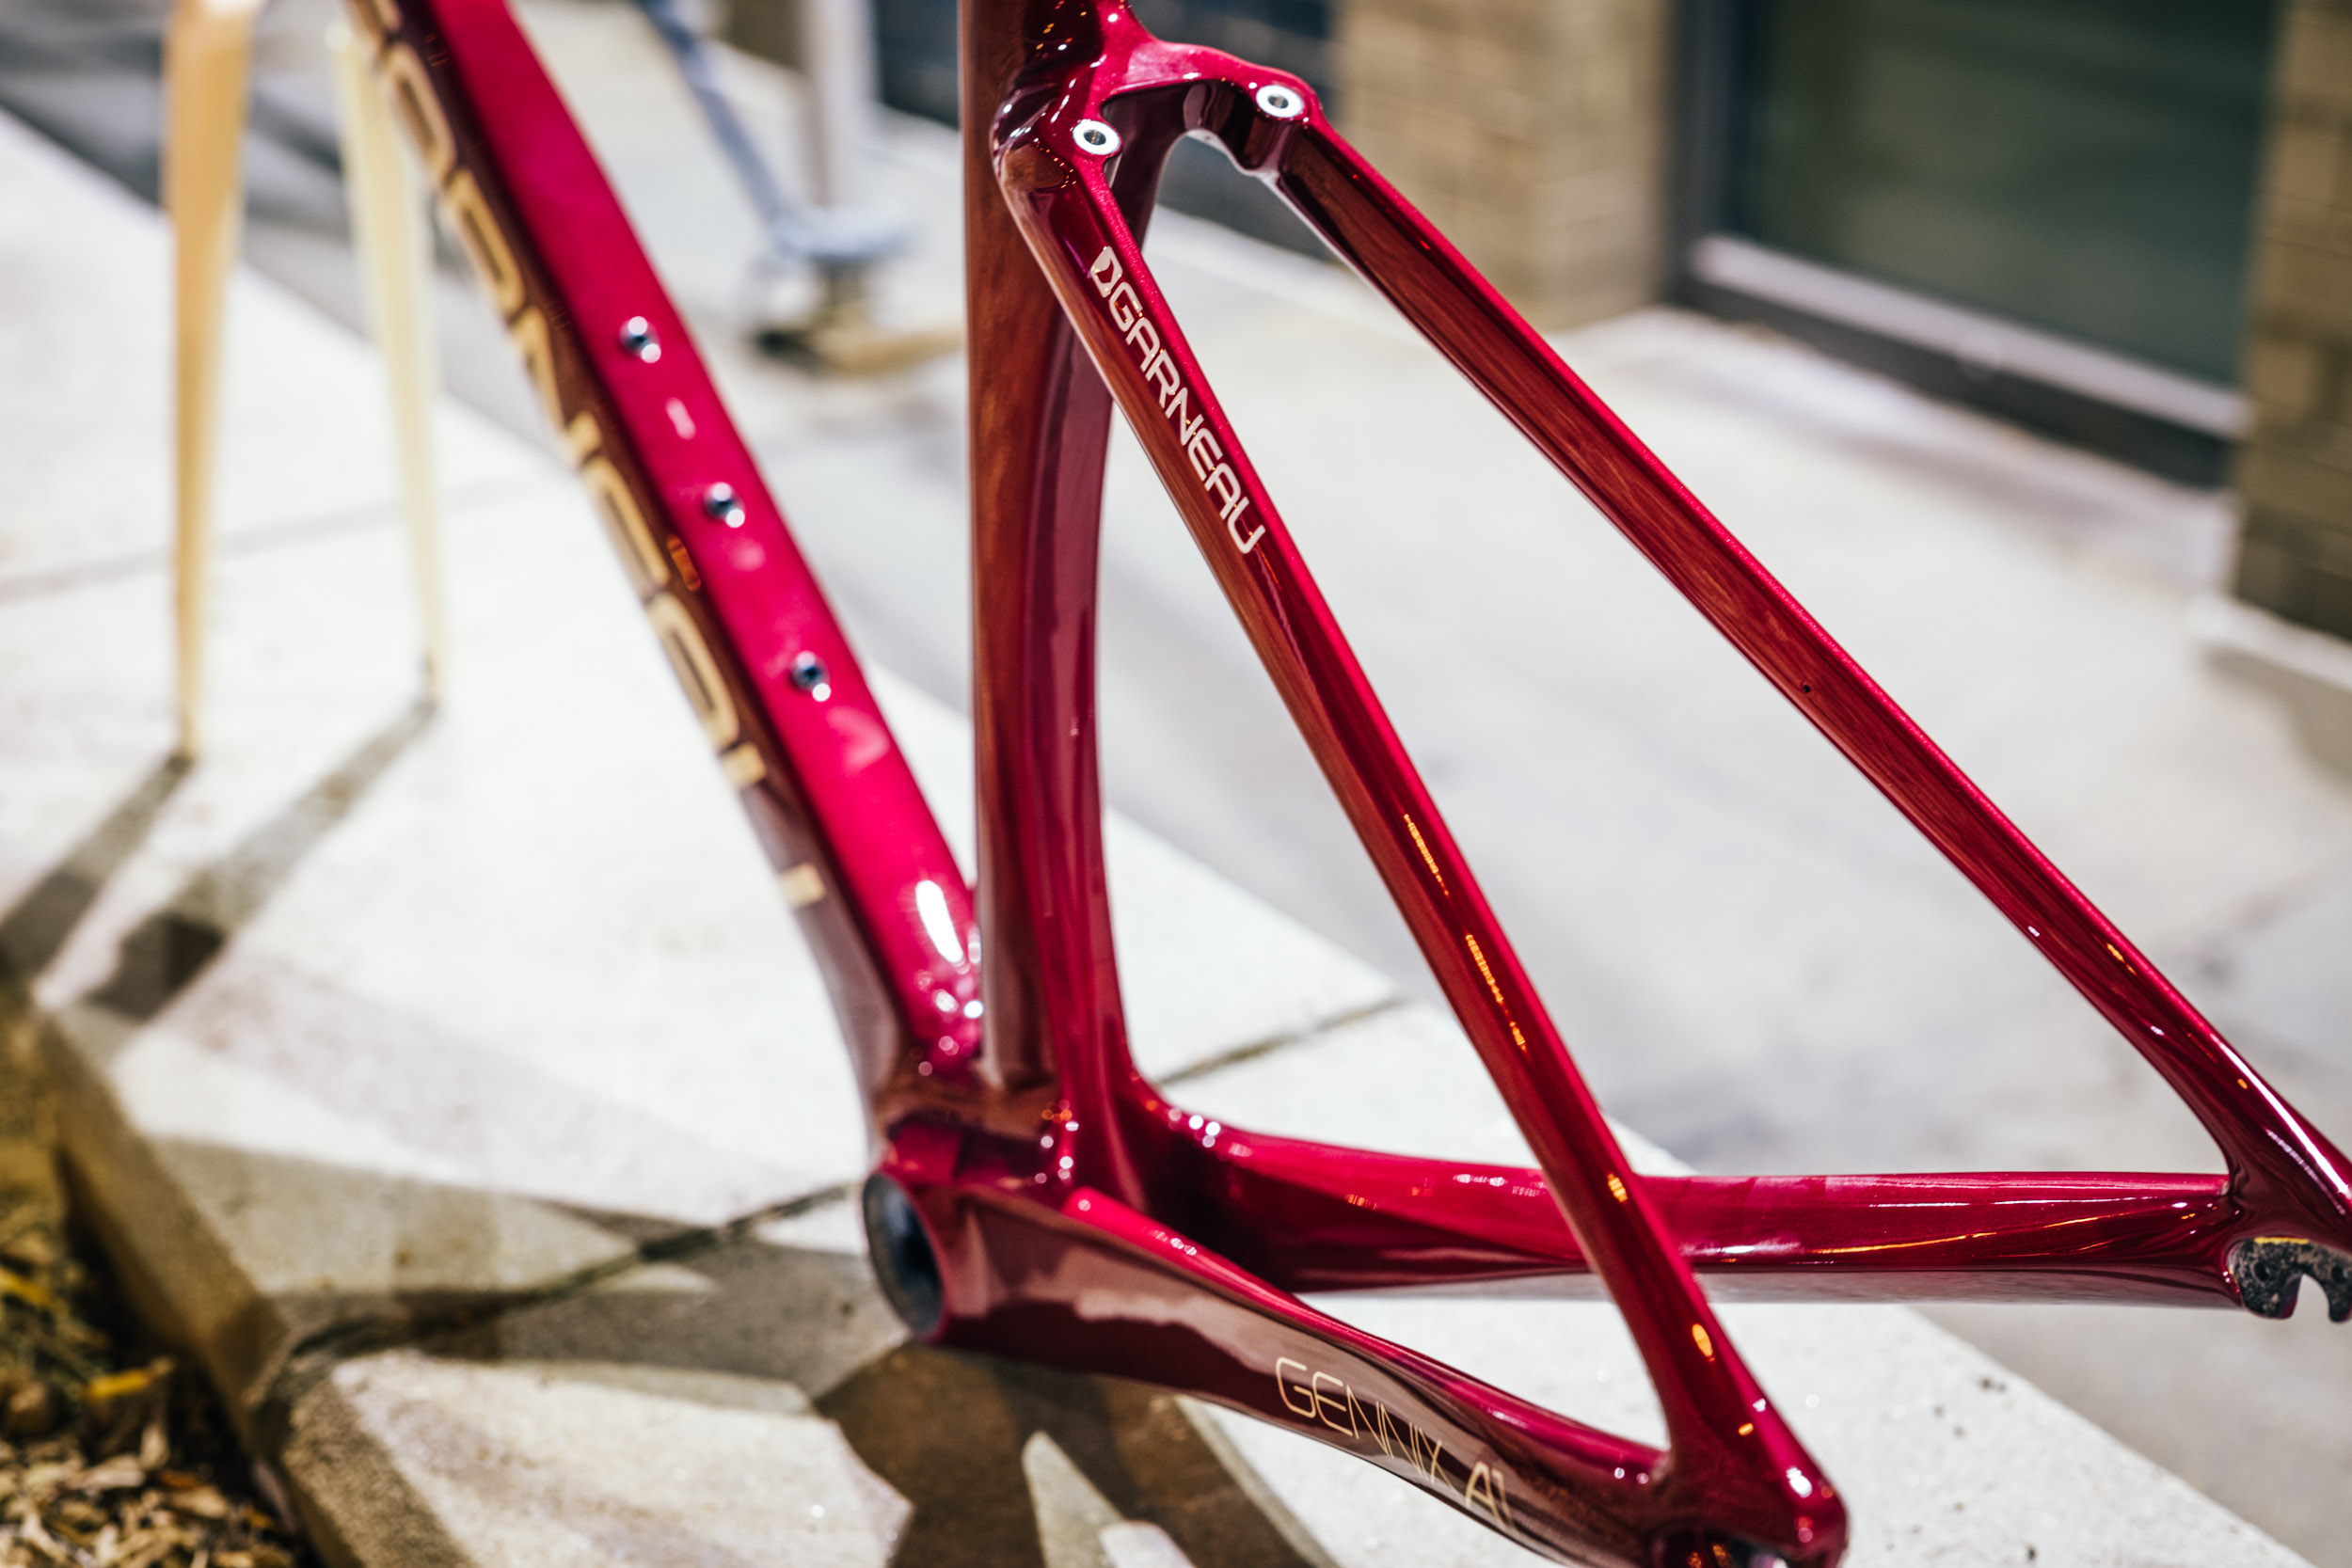 to-be-determined-photo-rhetoric-garneau-team-bikes-106.jpg